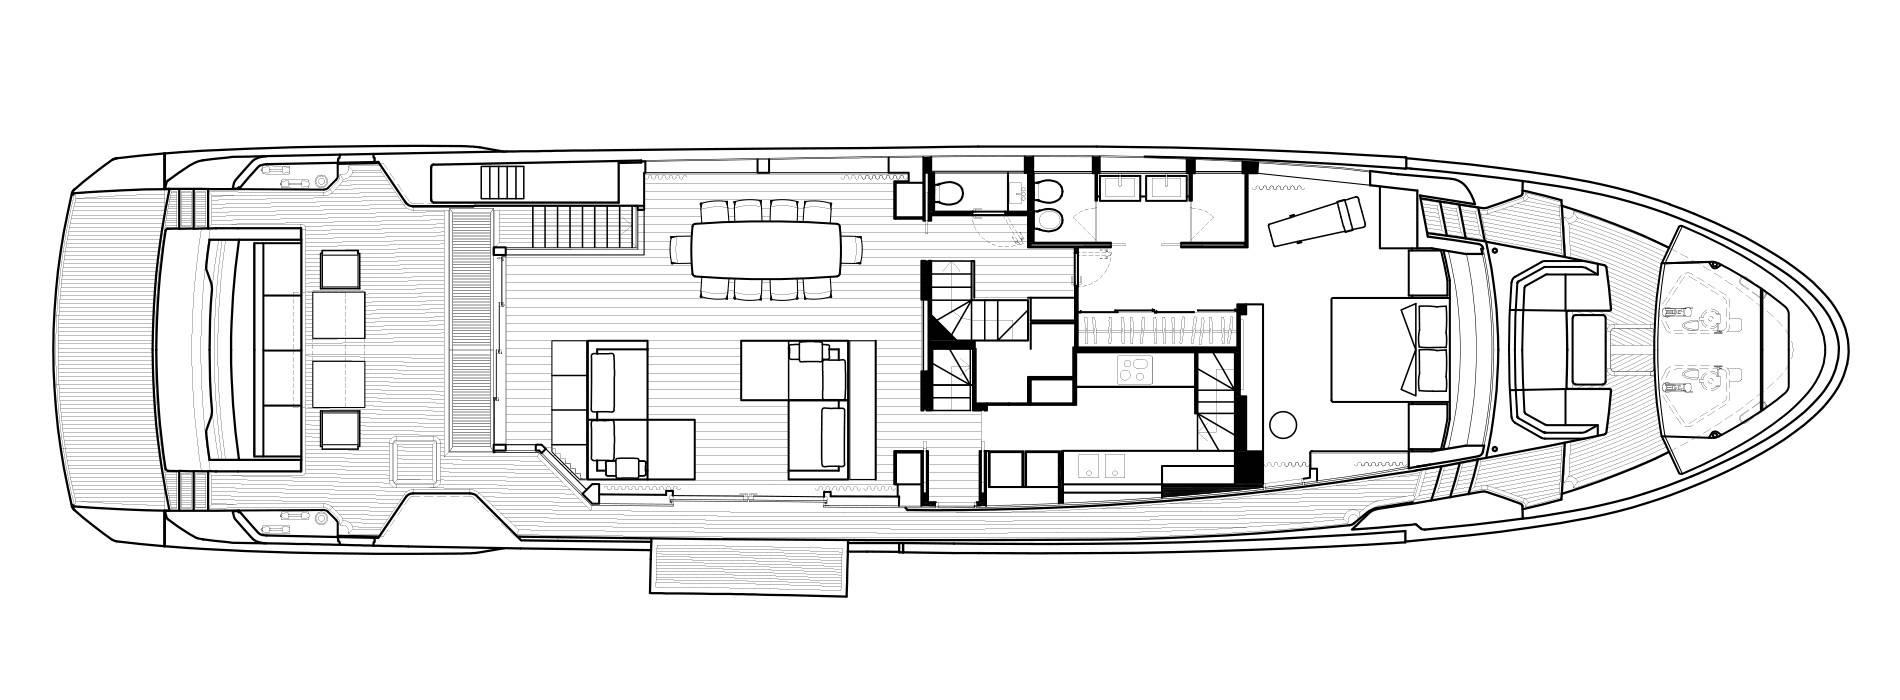 Sanlorenzo Yachts SL102 Asymmetric Главная палуба